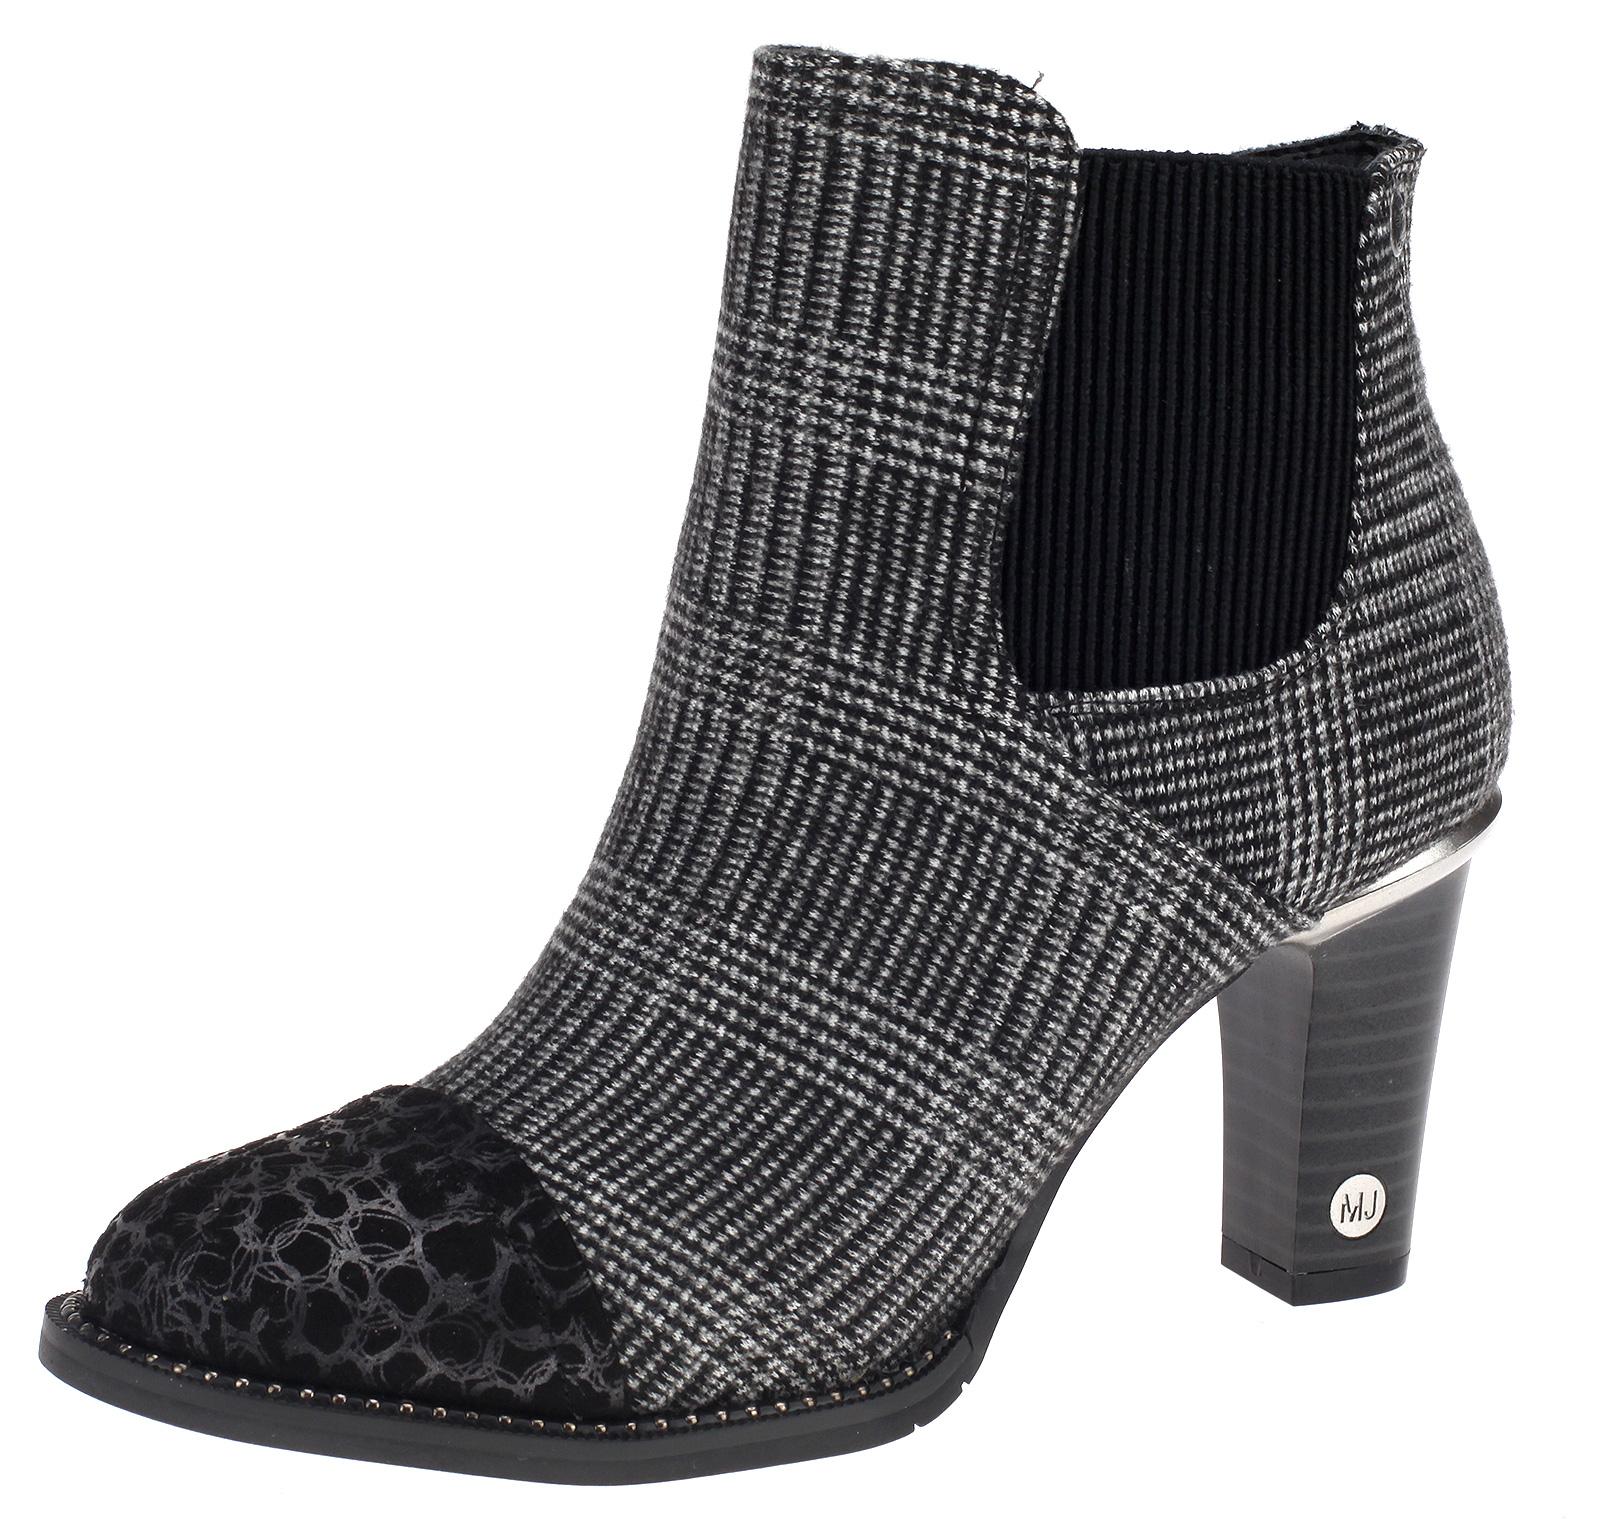 8aaa92476de5 Details zu Mustang Damen Stiefeletten Stiefel Boots Schuhe 1335-523-92  schwarz grau